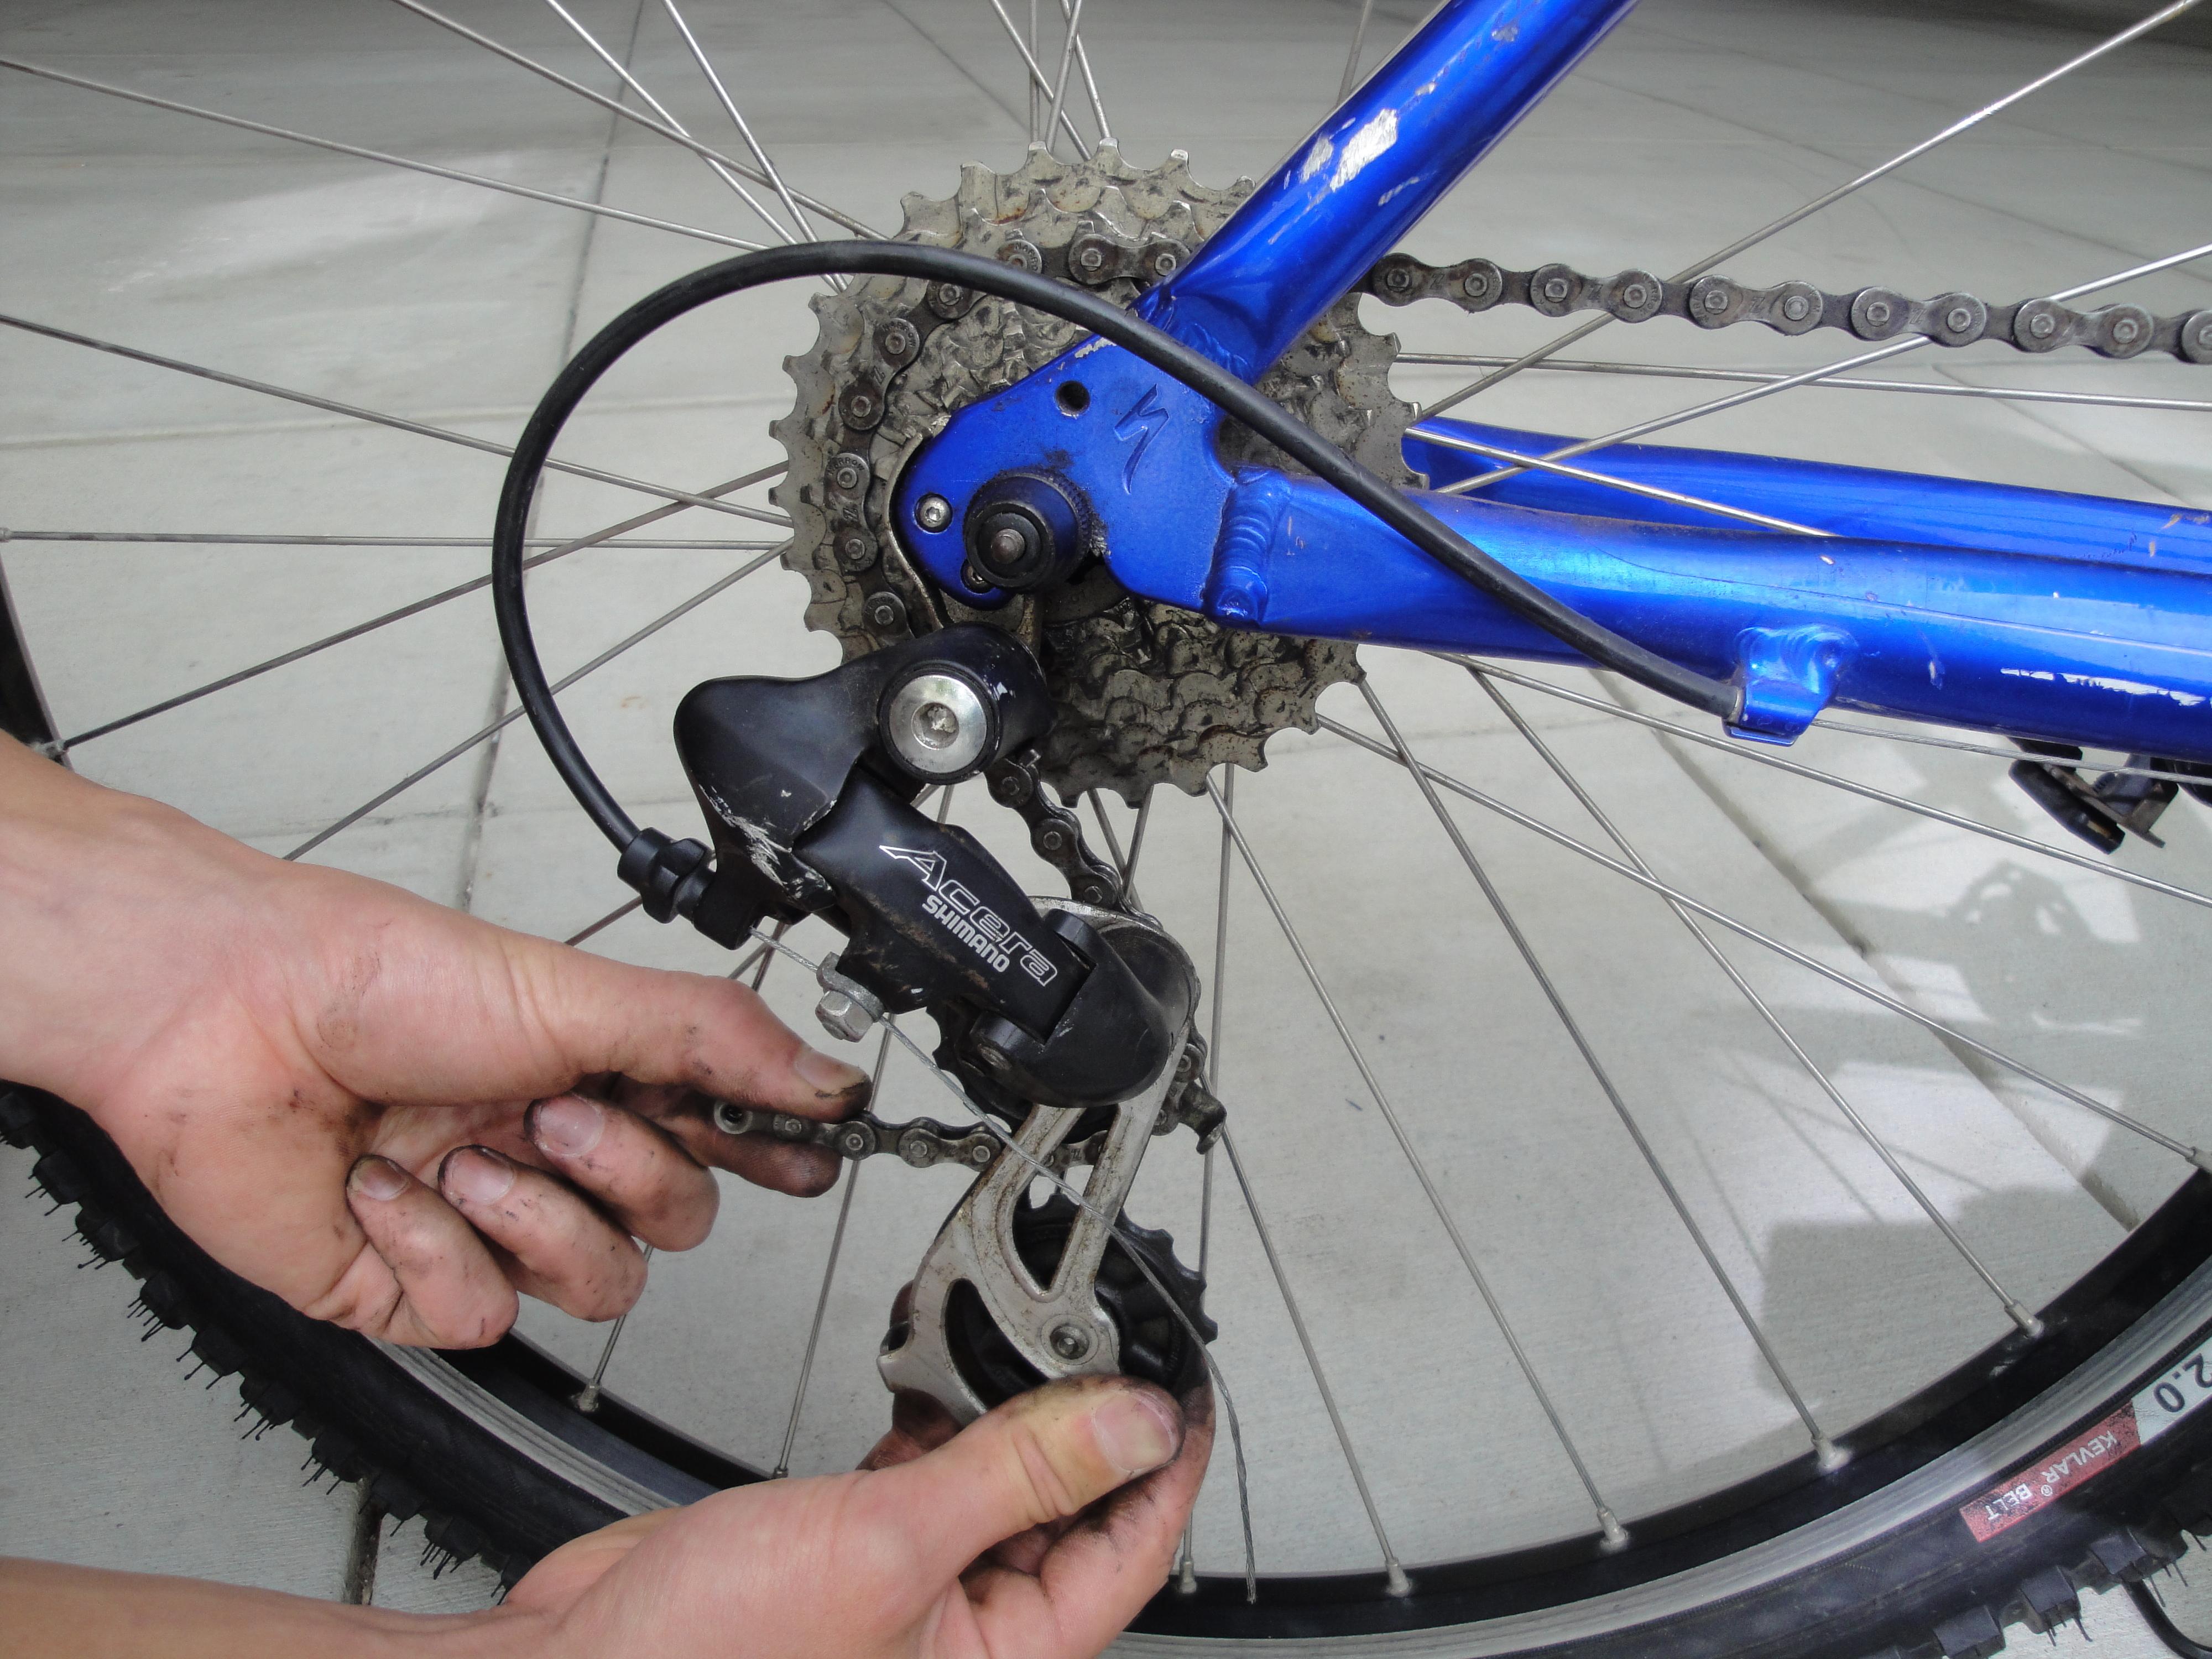 Ремонт велосипеда шимано своими руками